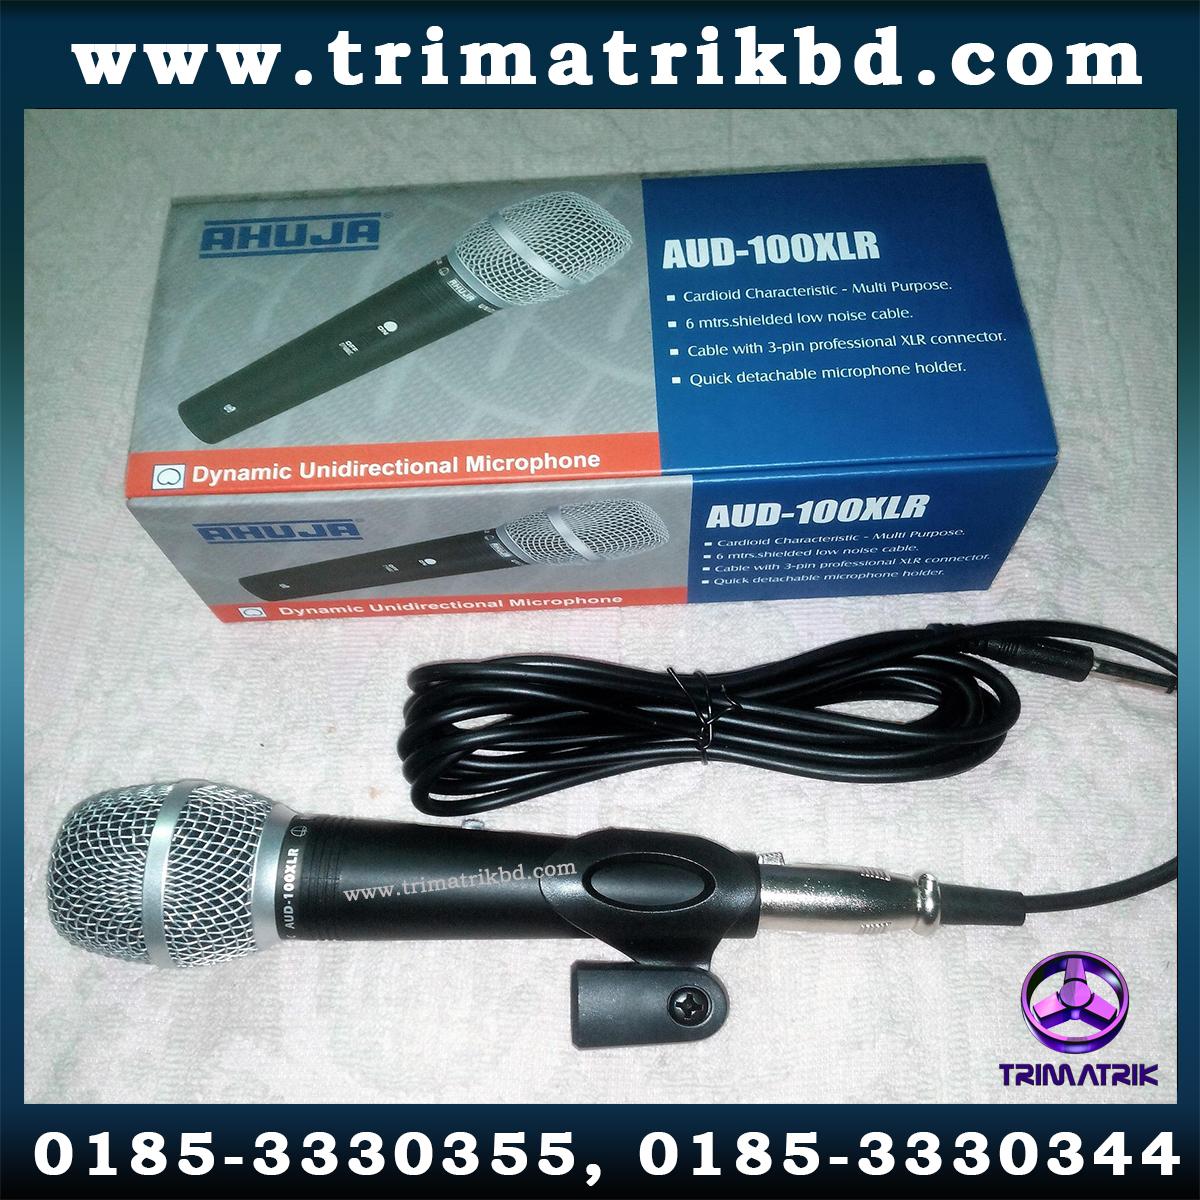 Ahuja Microphone Price in Bangladesh